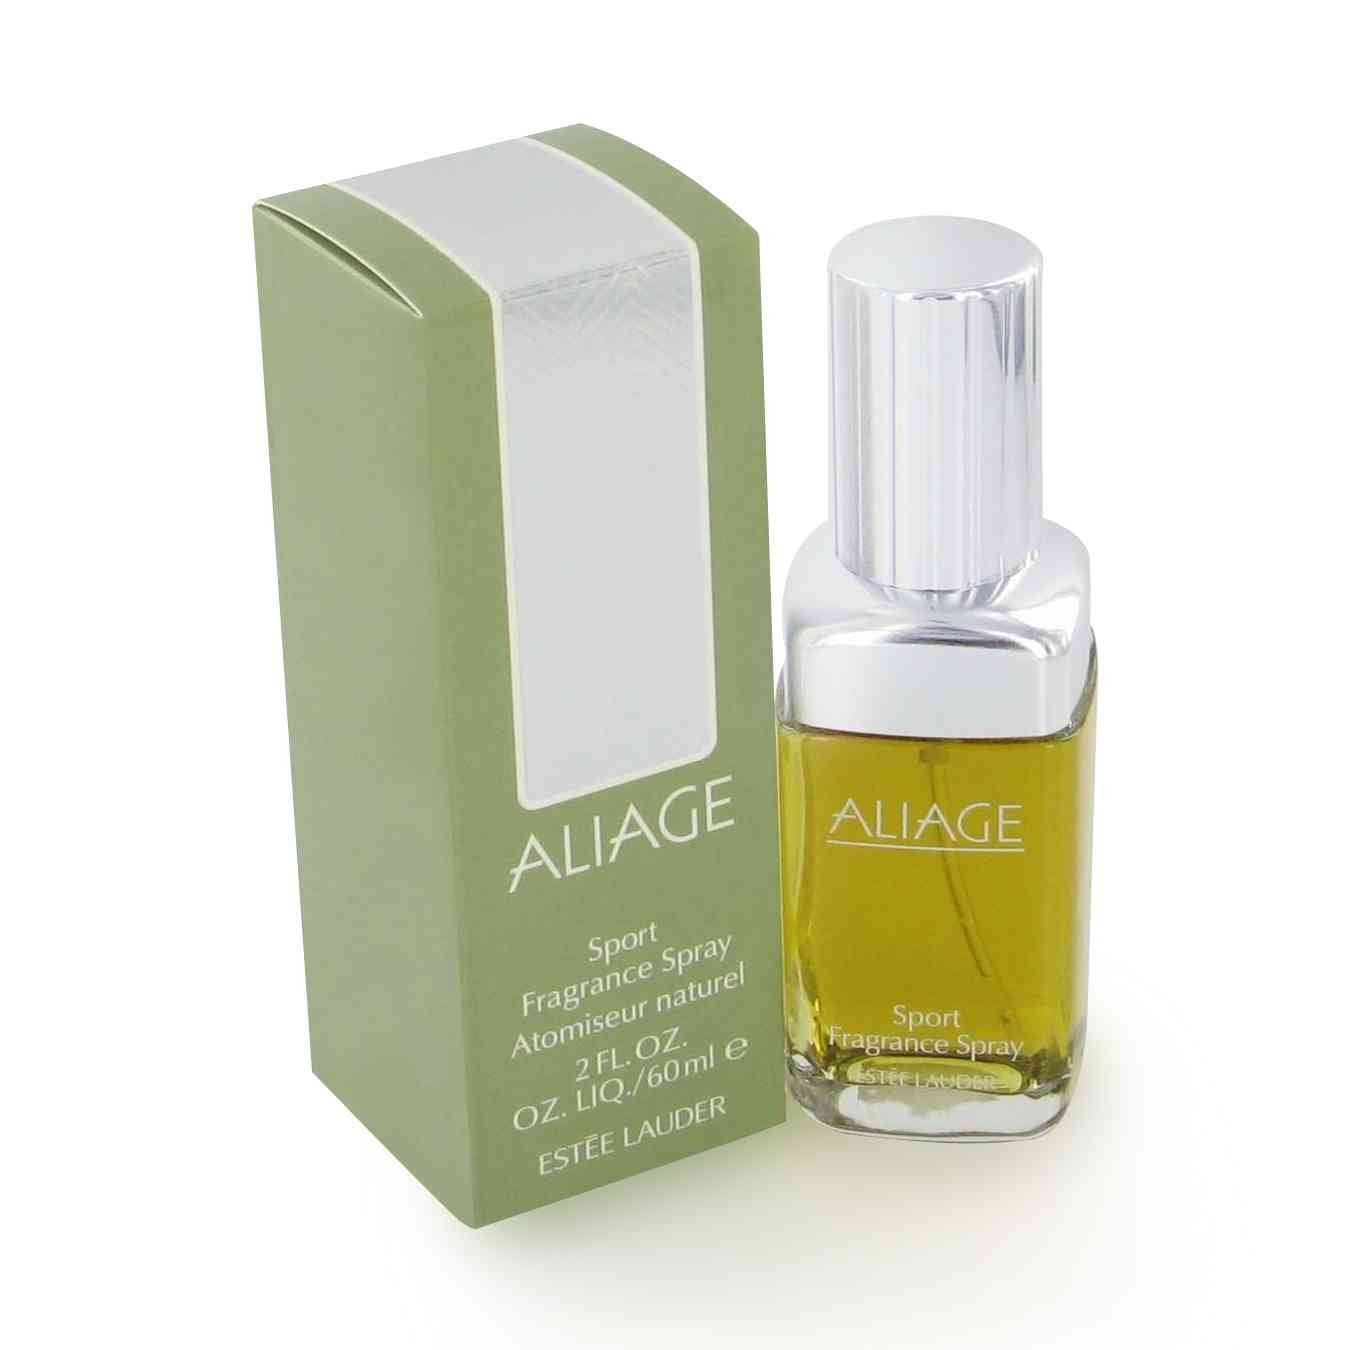 Buy Aliage Perfume By Estee Lauder For Women Sport Fragrance Spray Pleasures Bloom Edp 100ml 20 Oz 60 Ml